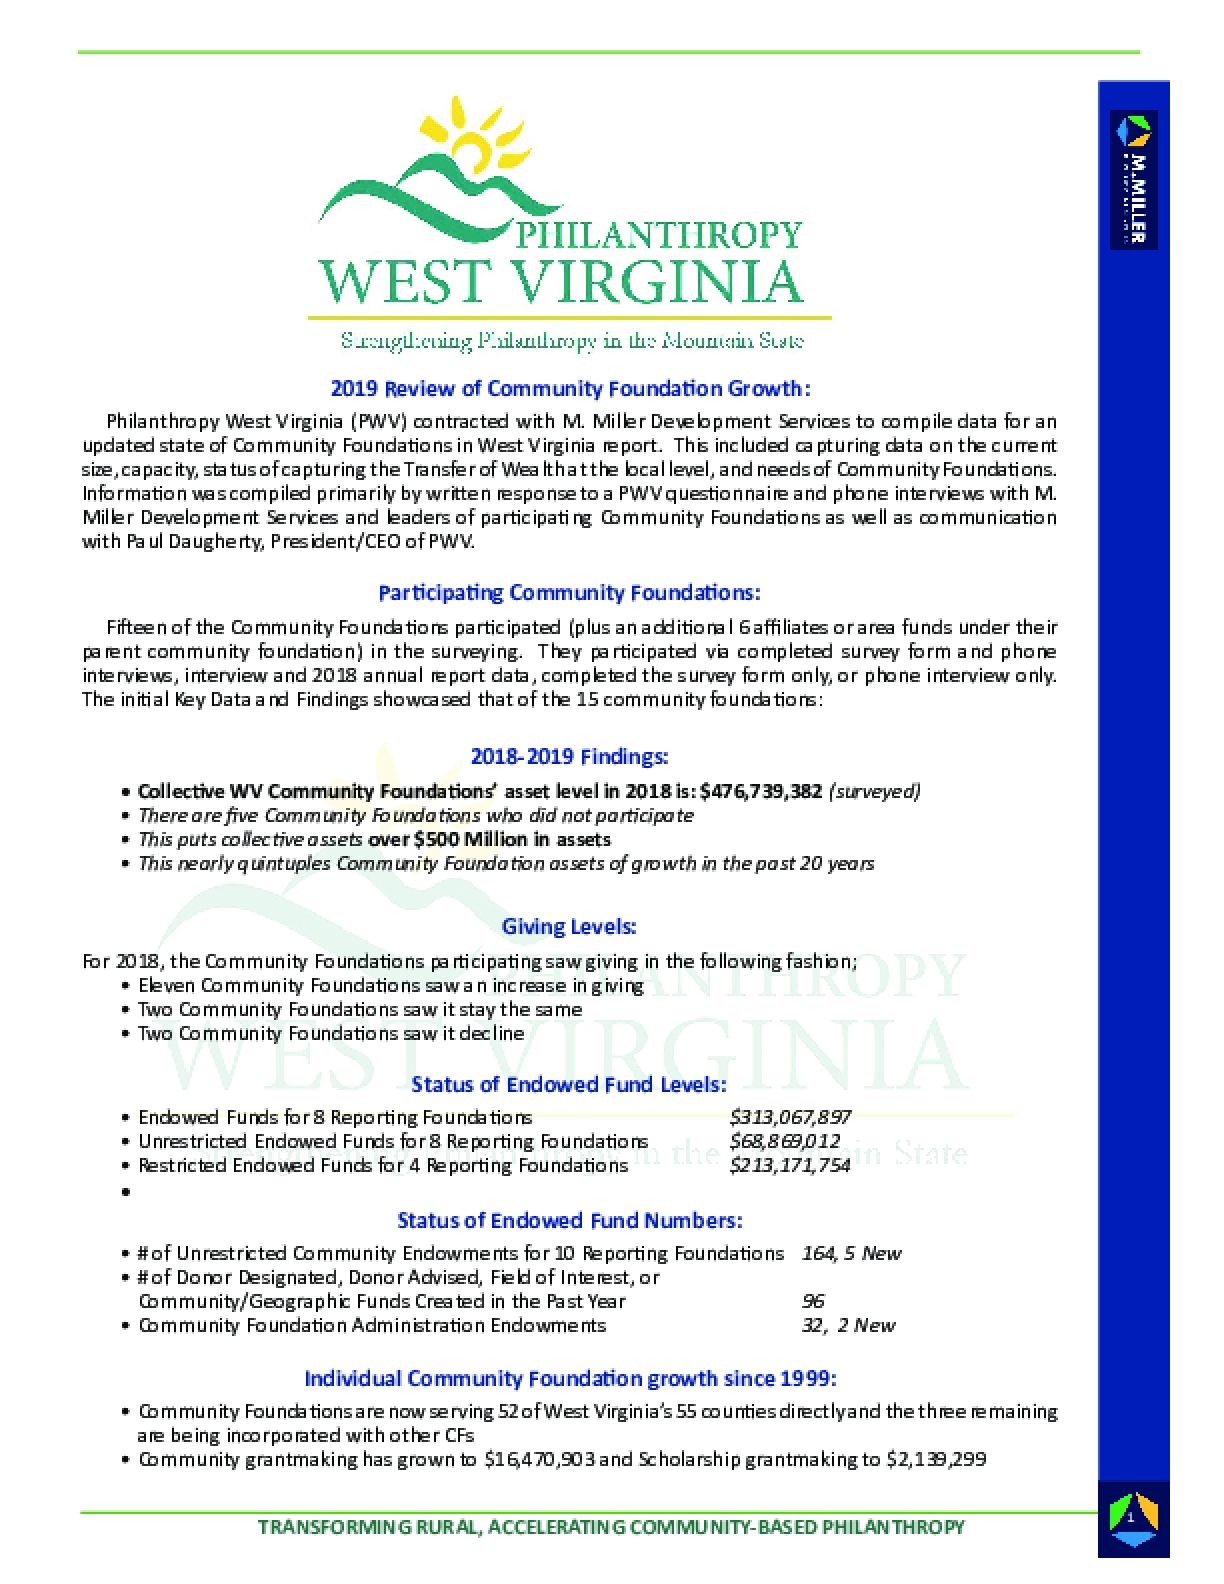 Summary of Transforming Rural: Accelerating Community-Based Philanthropy